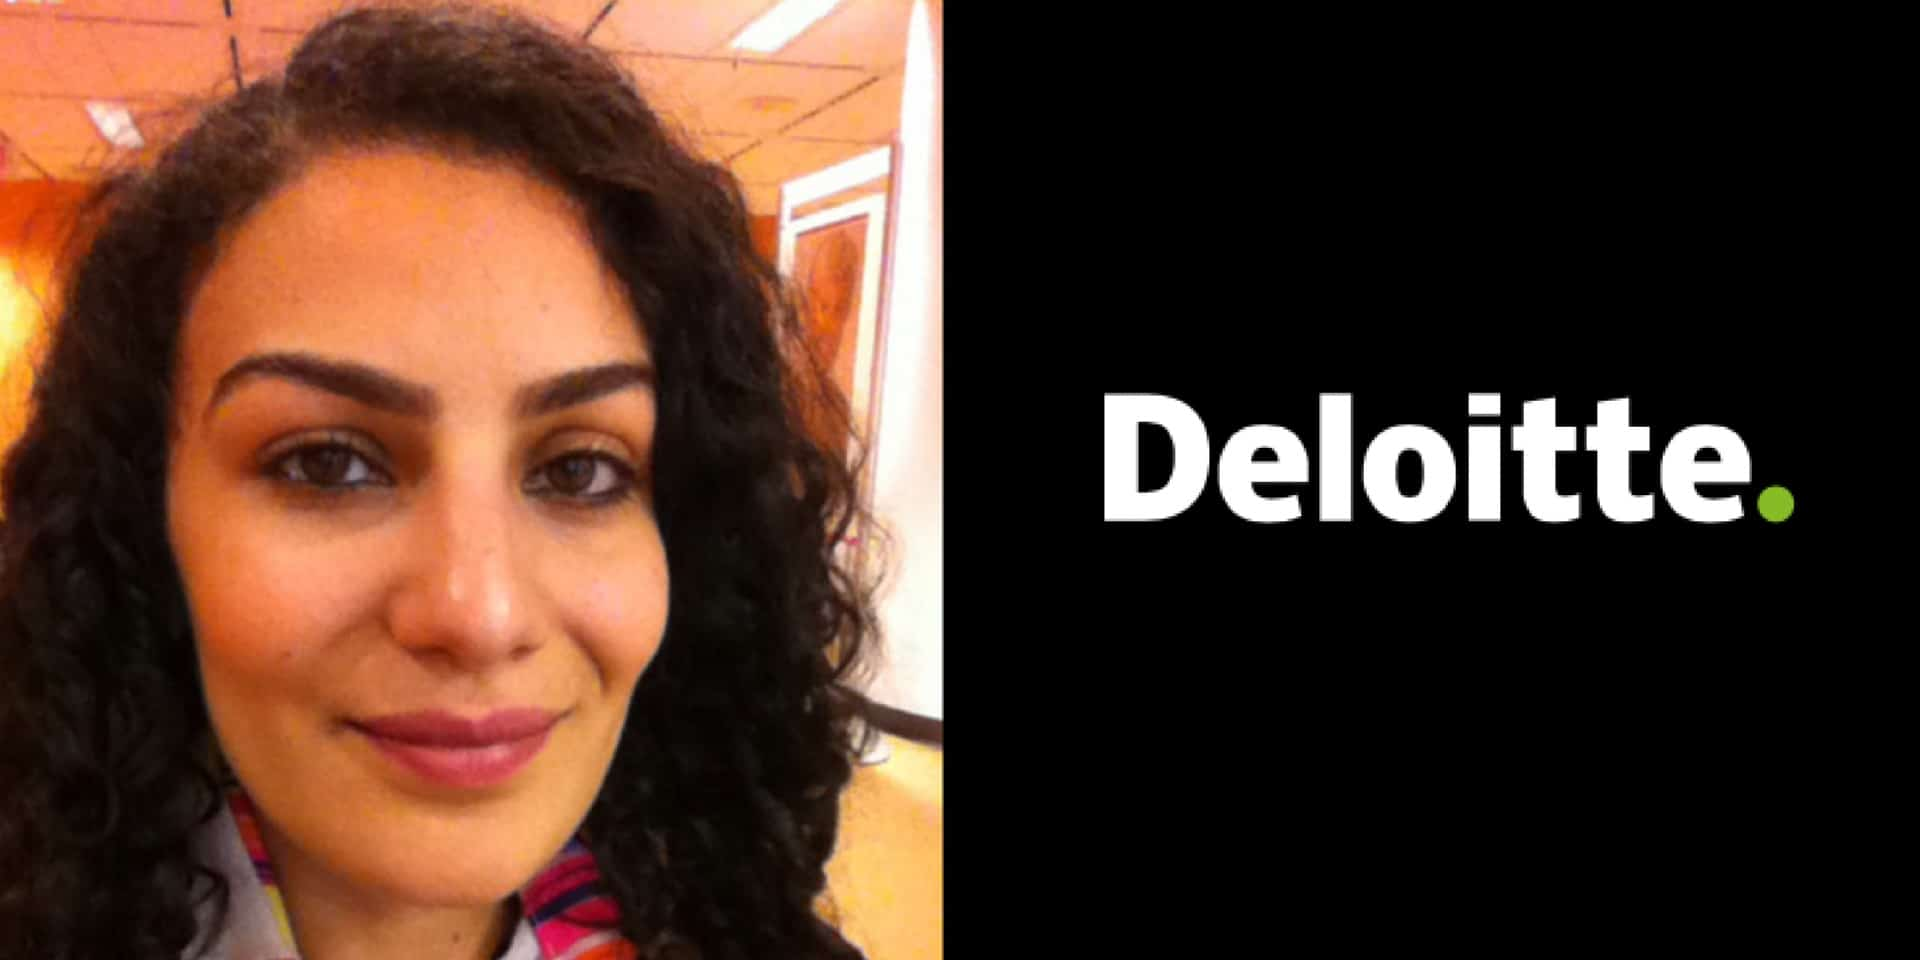 Nadia Dibs | Deloitte